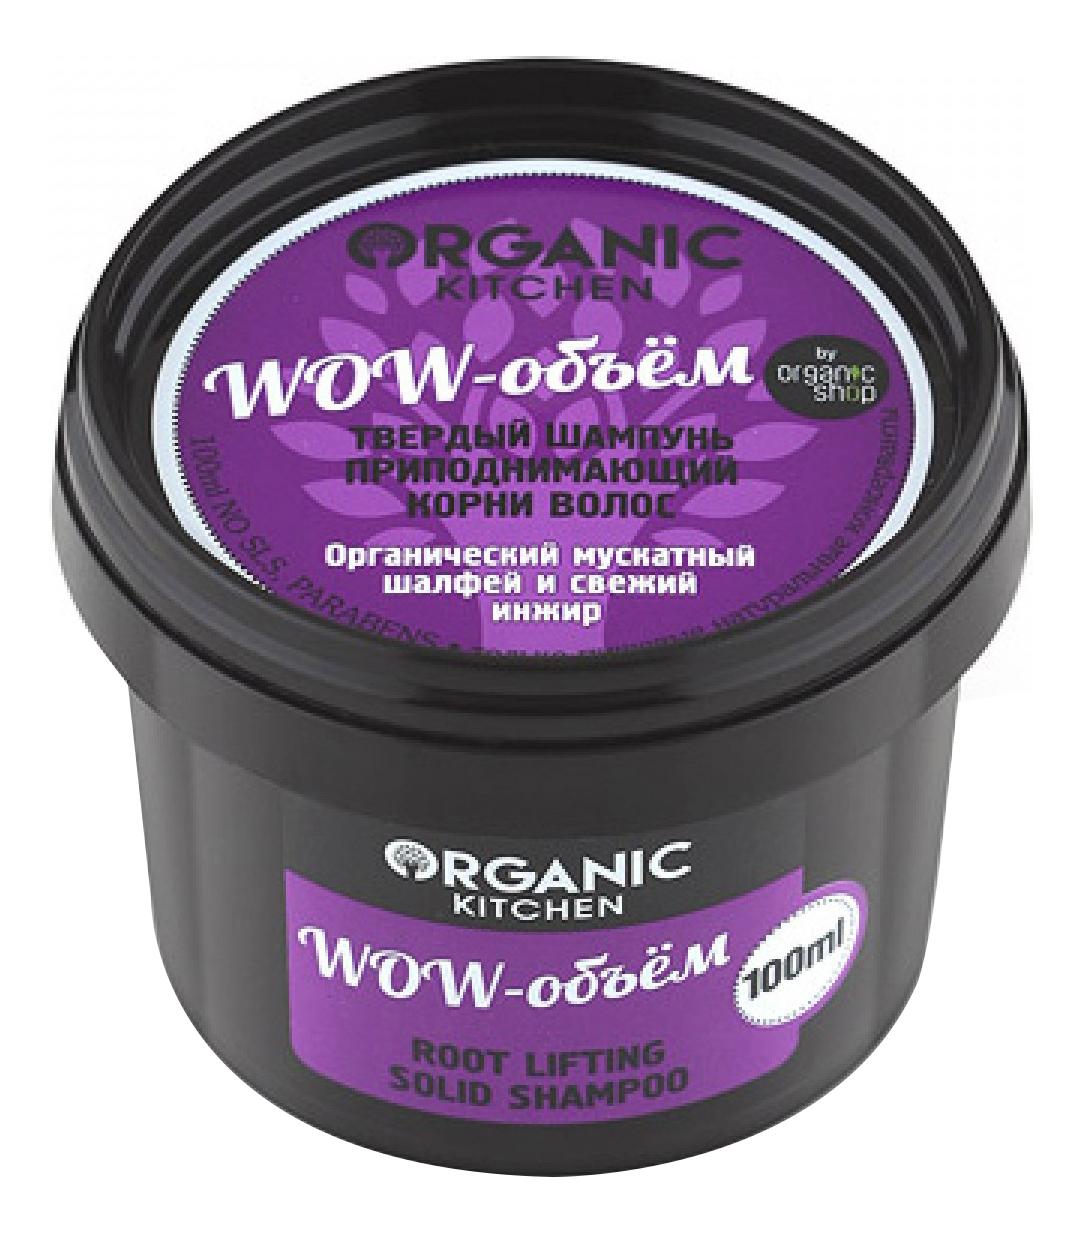 Твердый шампунь приподнимающий корни волос Wow-объем Organic Kitchen Root Liftung Solid Shampoo 100мл бальзам organic shop organic kitchen root lifting hair conditioner wow объем объем 100 мл